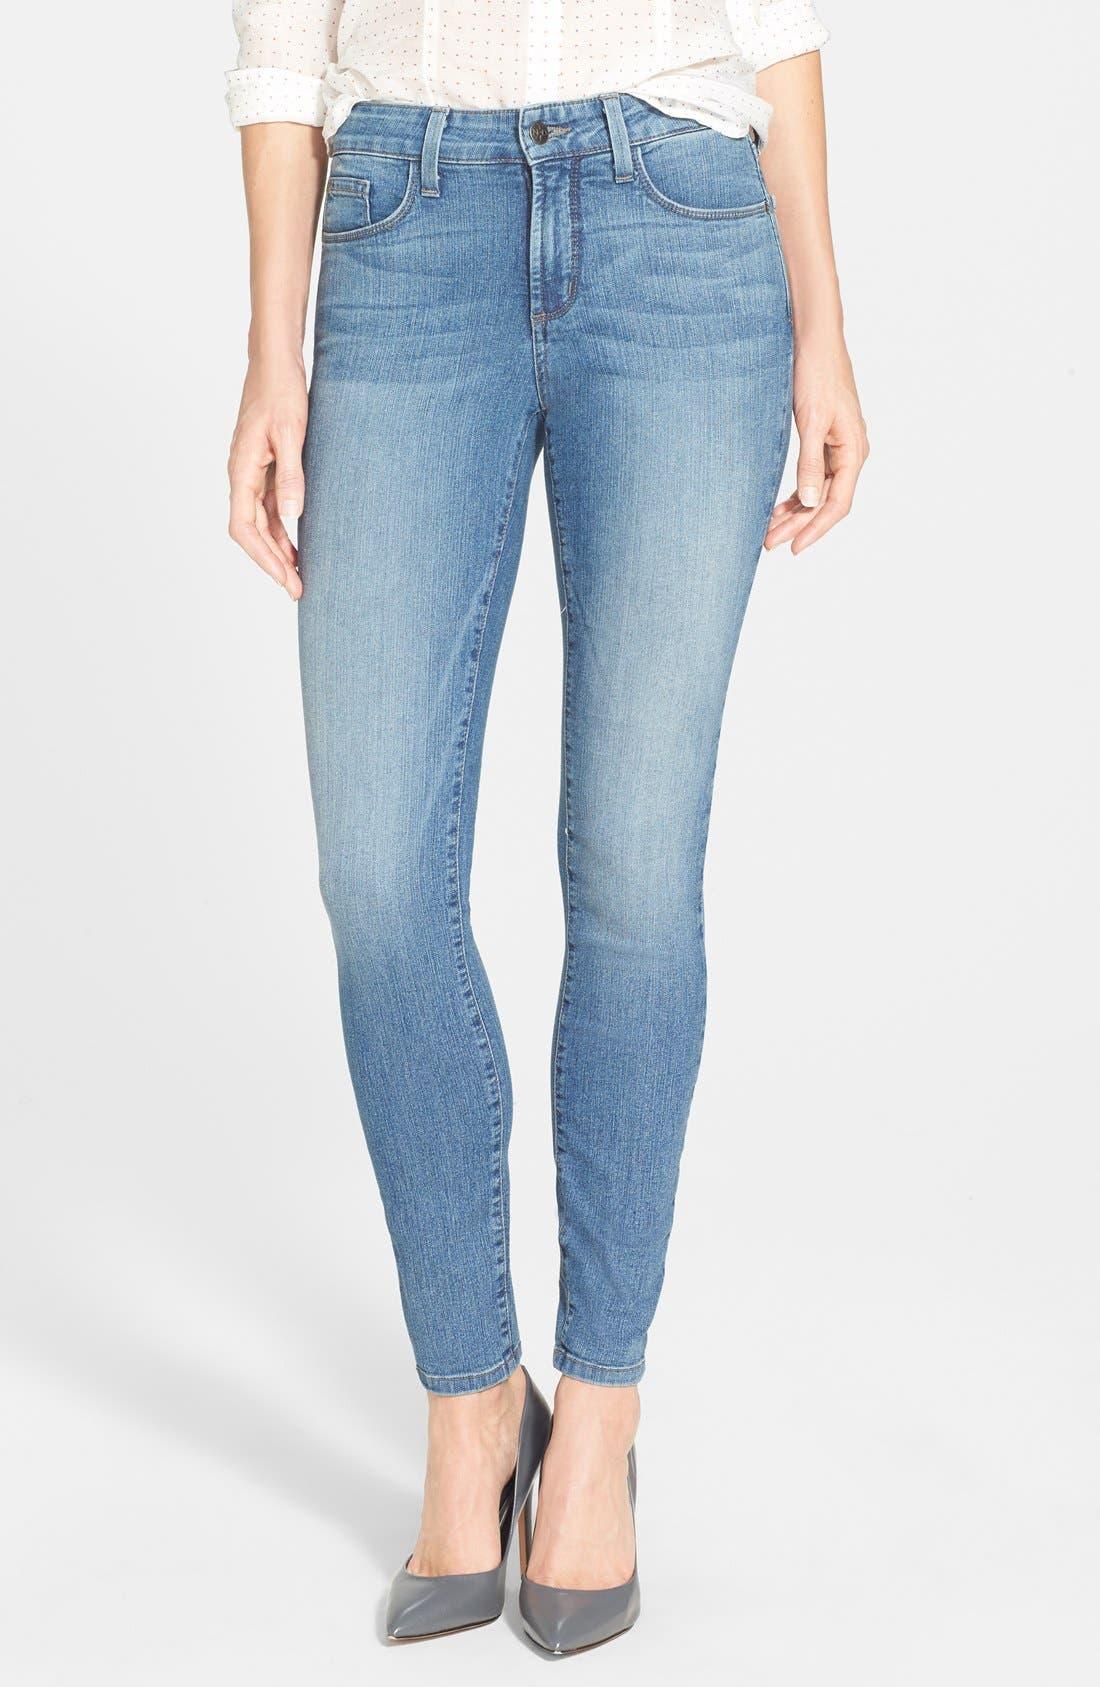 Alternate Image 1 Selected - NYDJ 'Ami' Stretch Super Skinny Jeans (Bellevue)